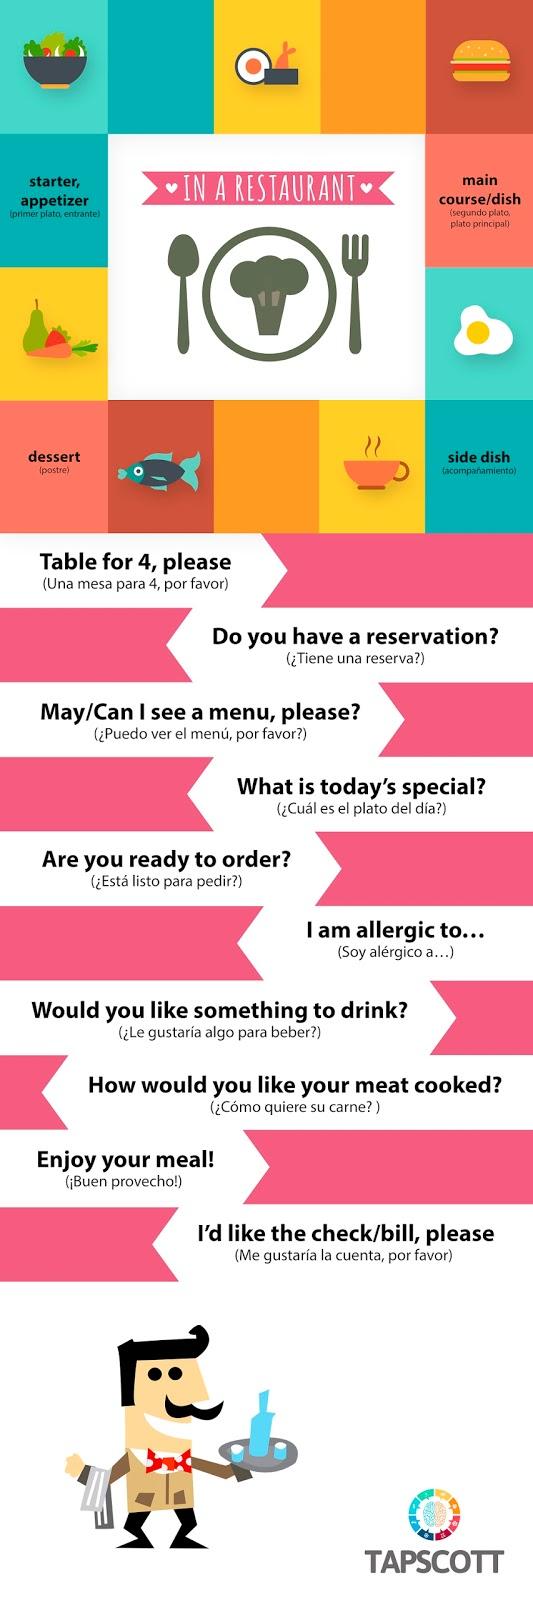 infografía: in a restaurant